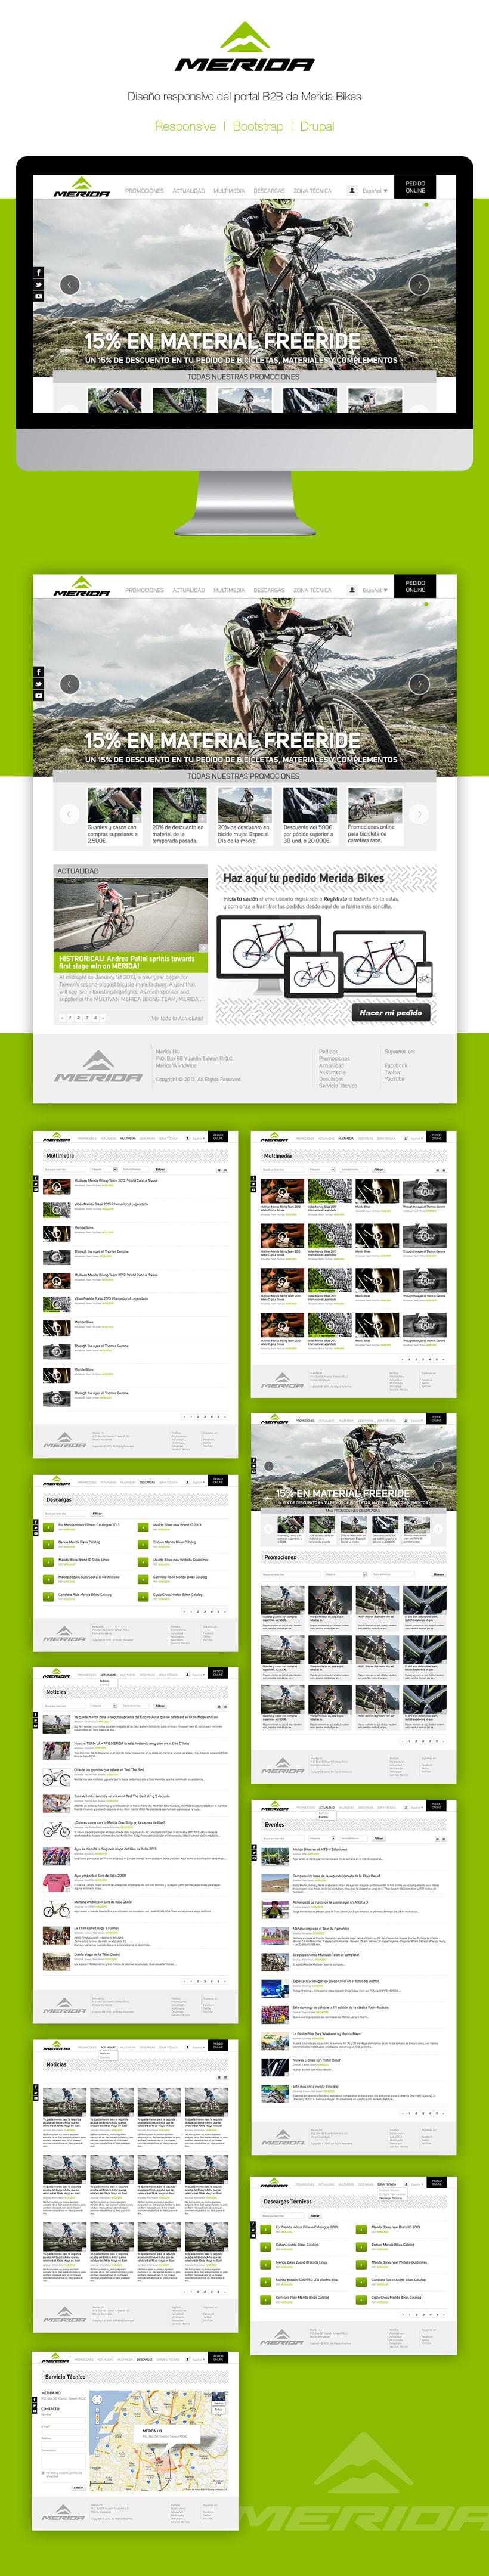 Merida Bikes | Ecommerce B2B -1